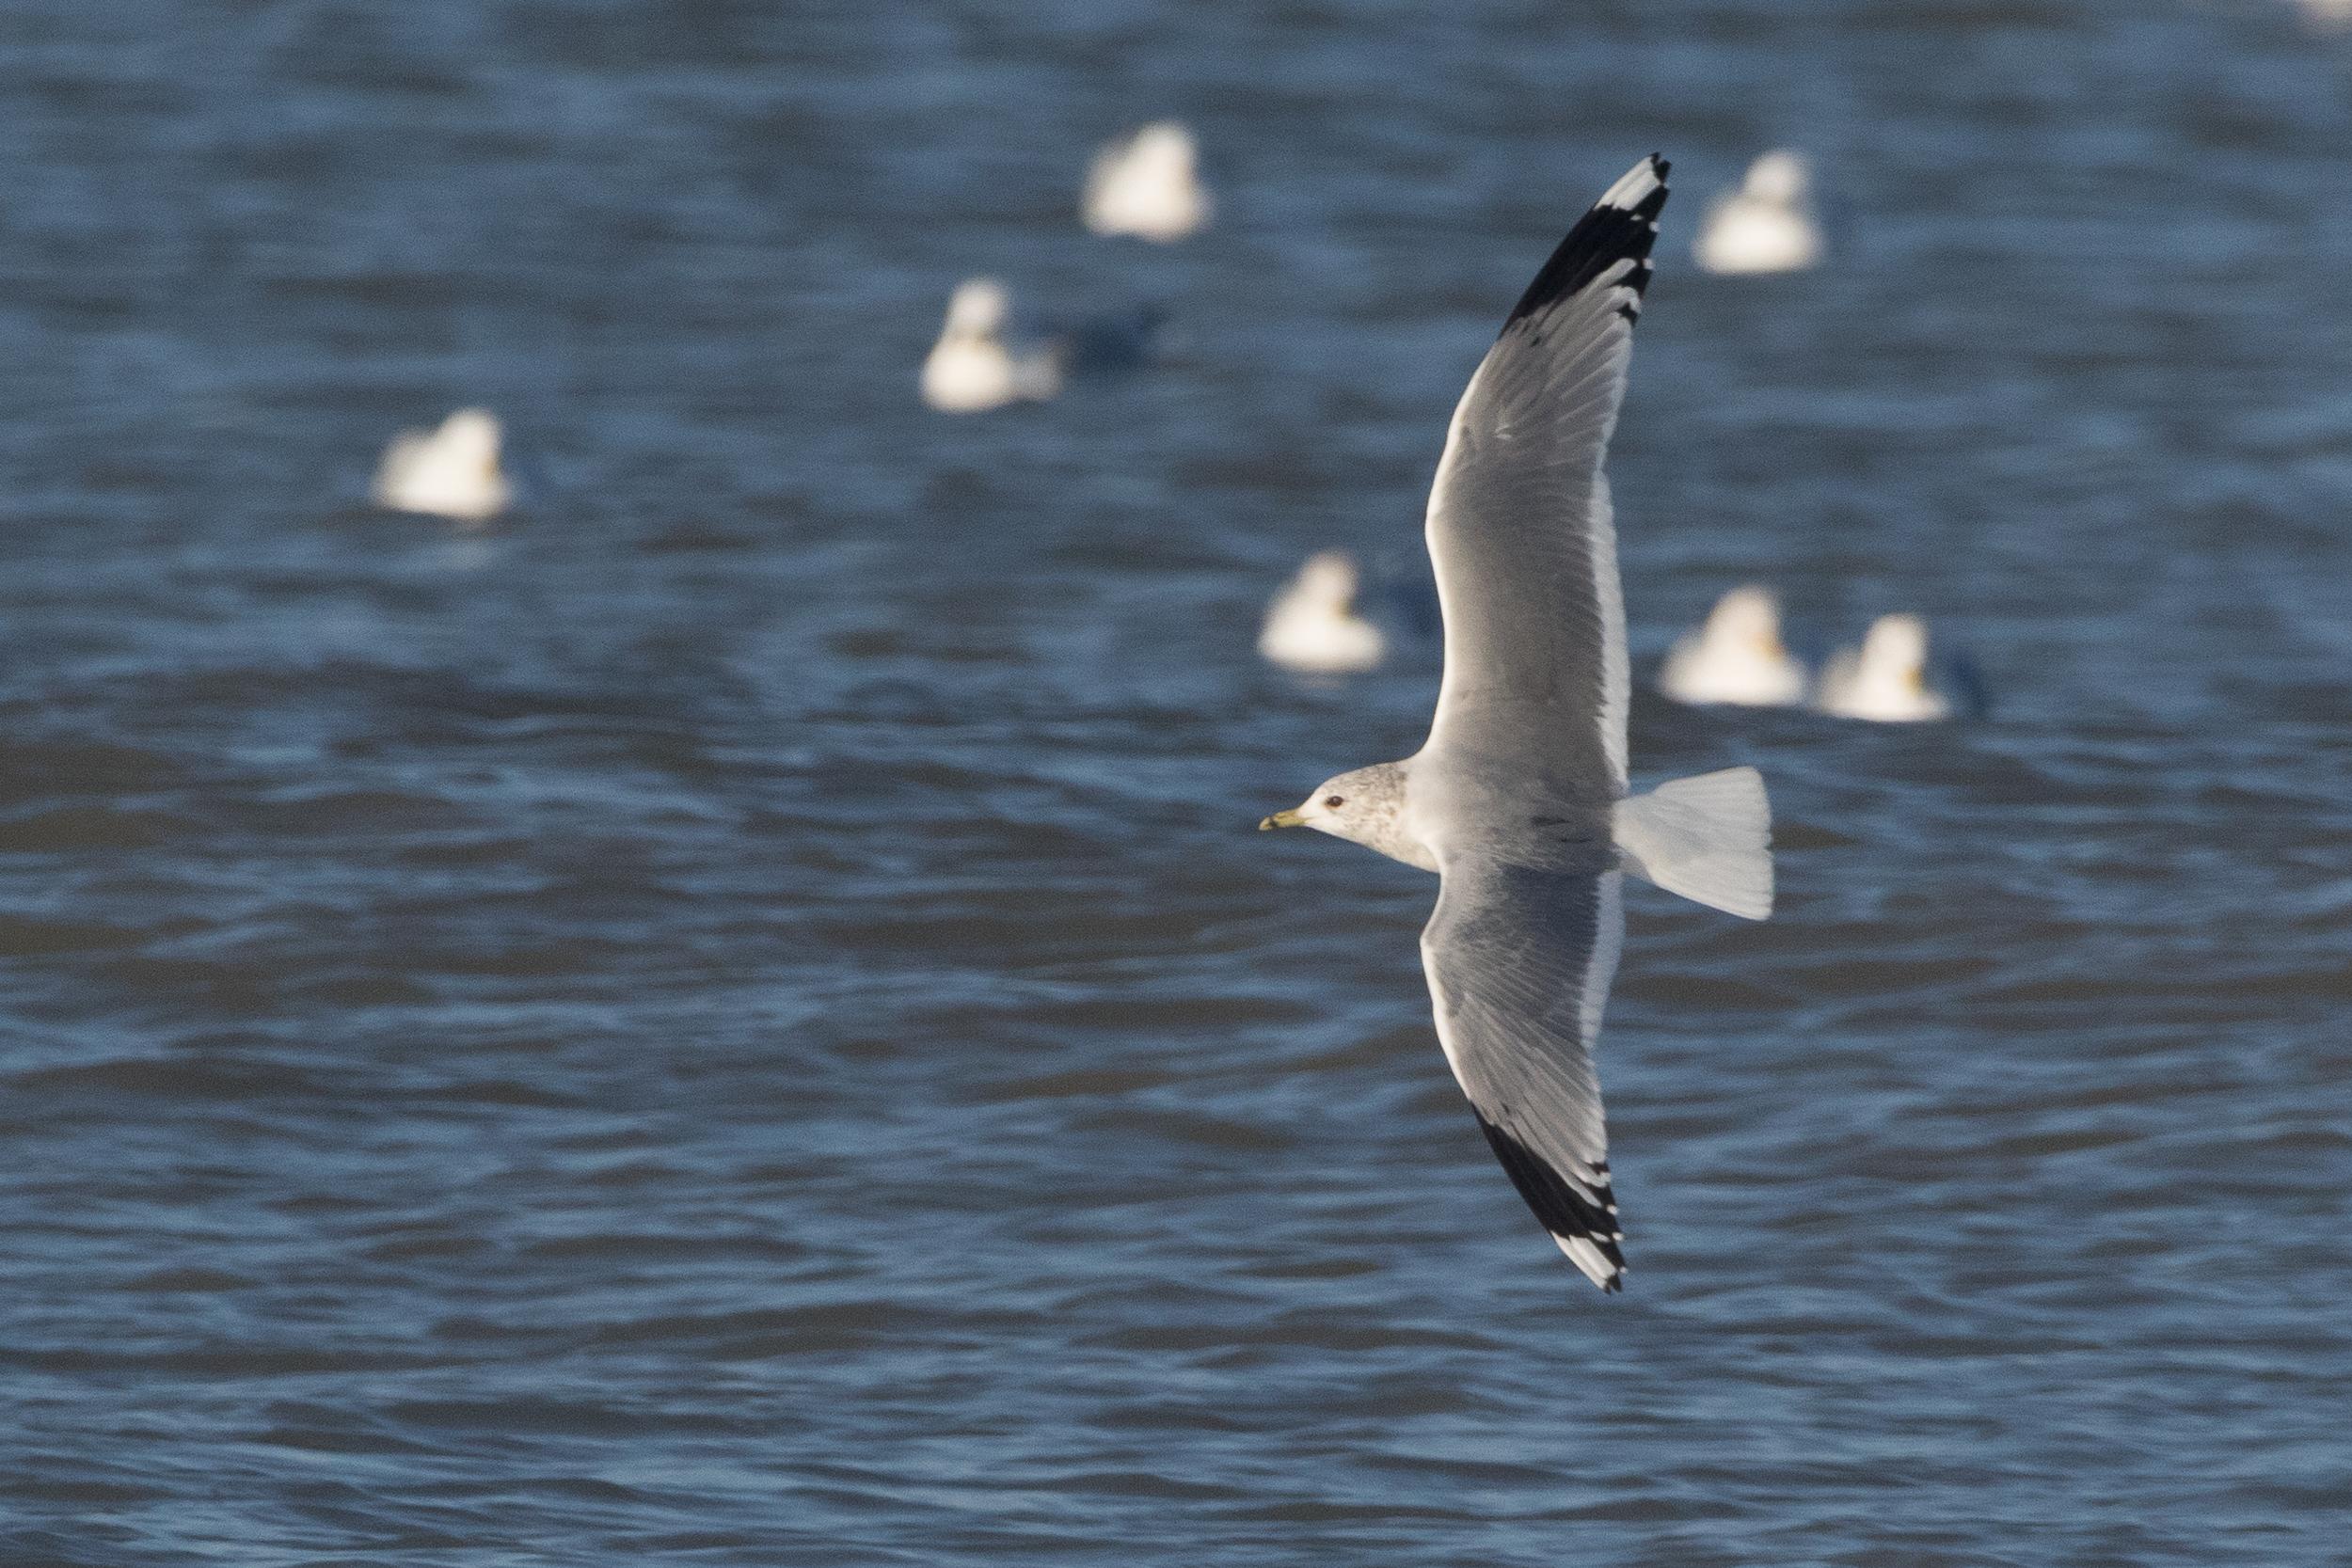 20170121-Common Gull Adult-06.jpg